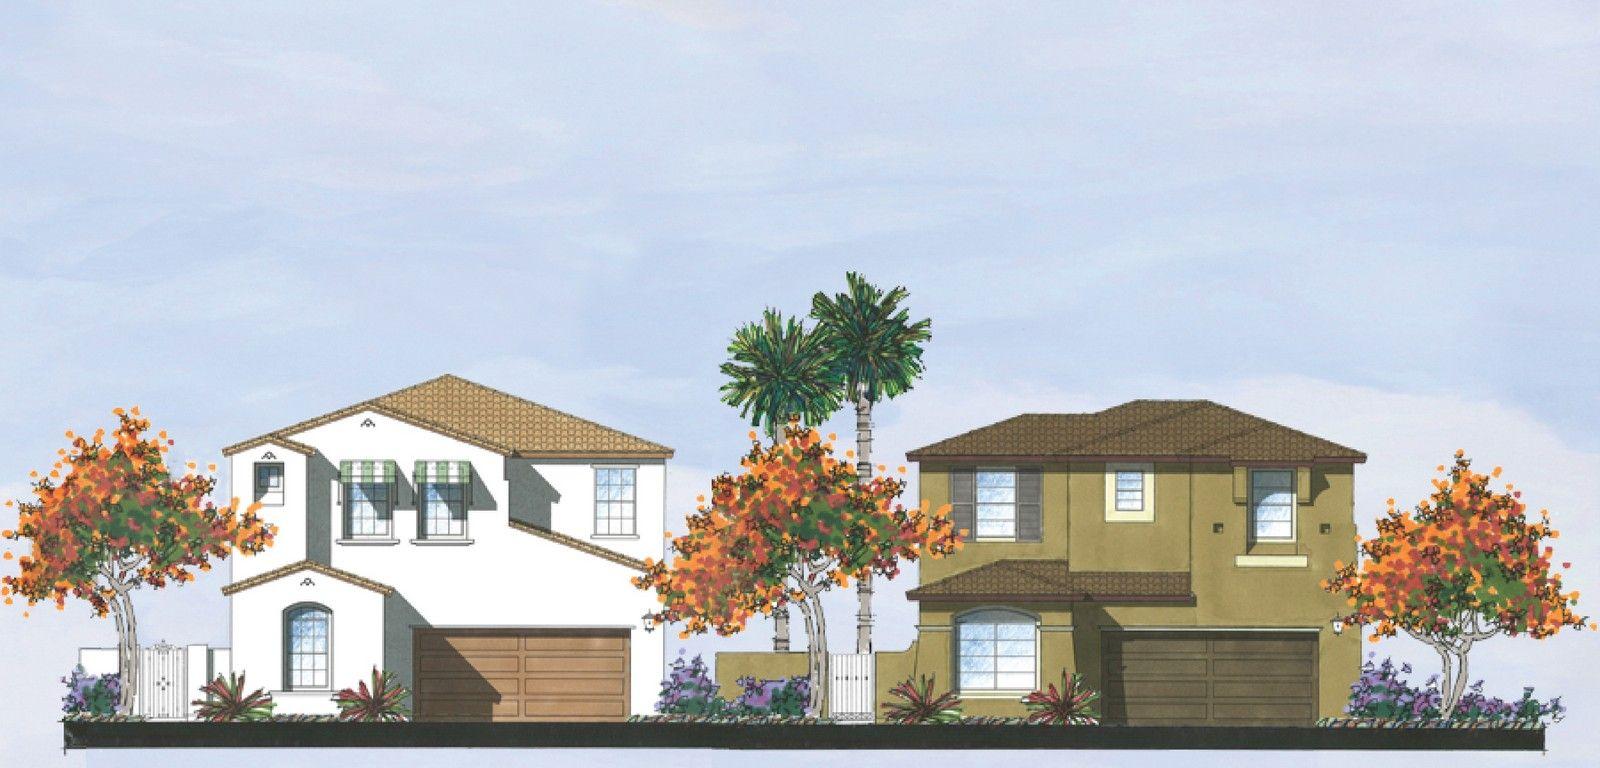 New Homes in Temecula, CA | 589 New Homes | NewHomeSource